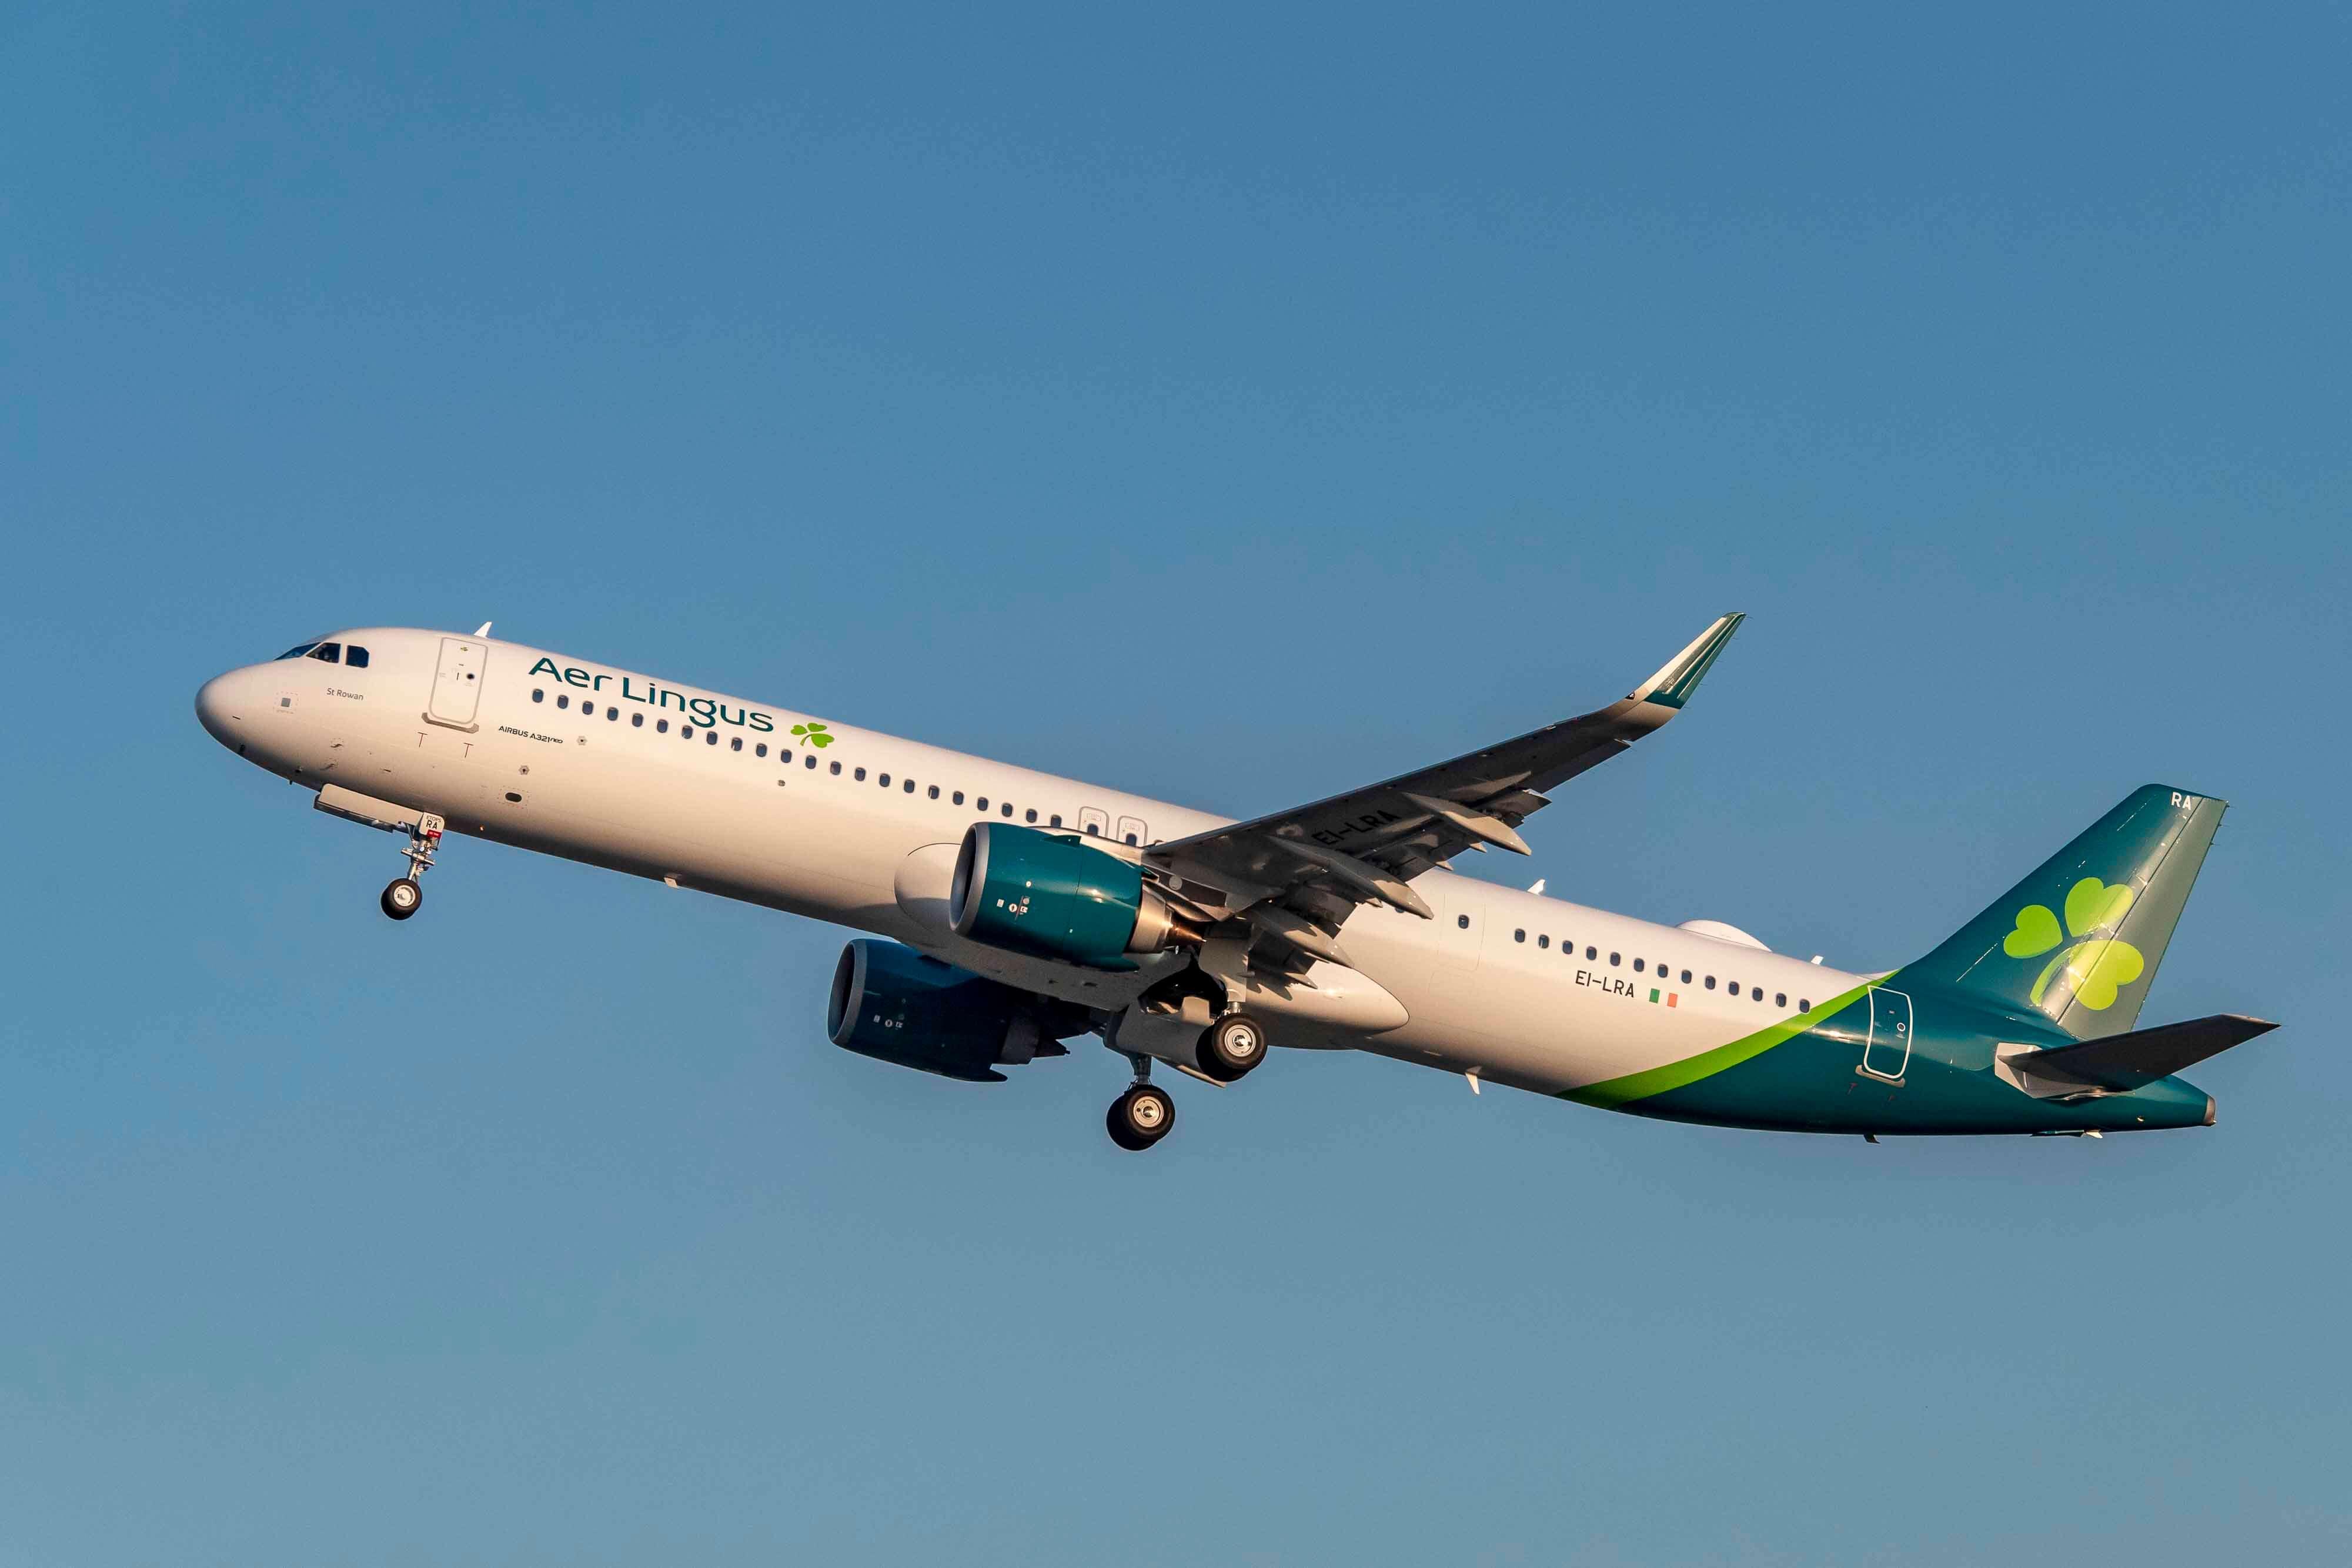 Aer Lingus তার প্রথম এয়ারবাস A321LR সরবরাহ করে takes